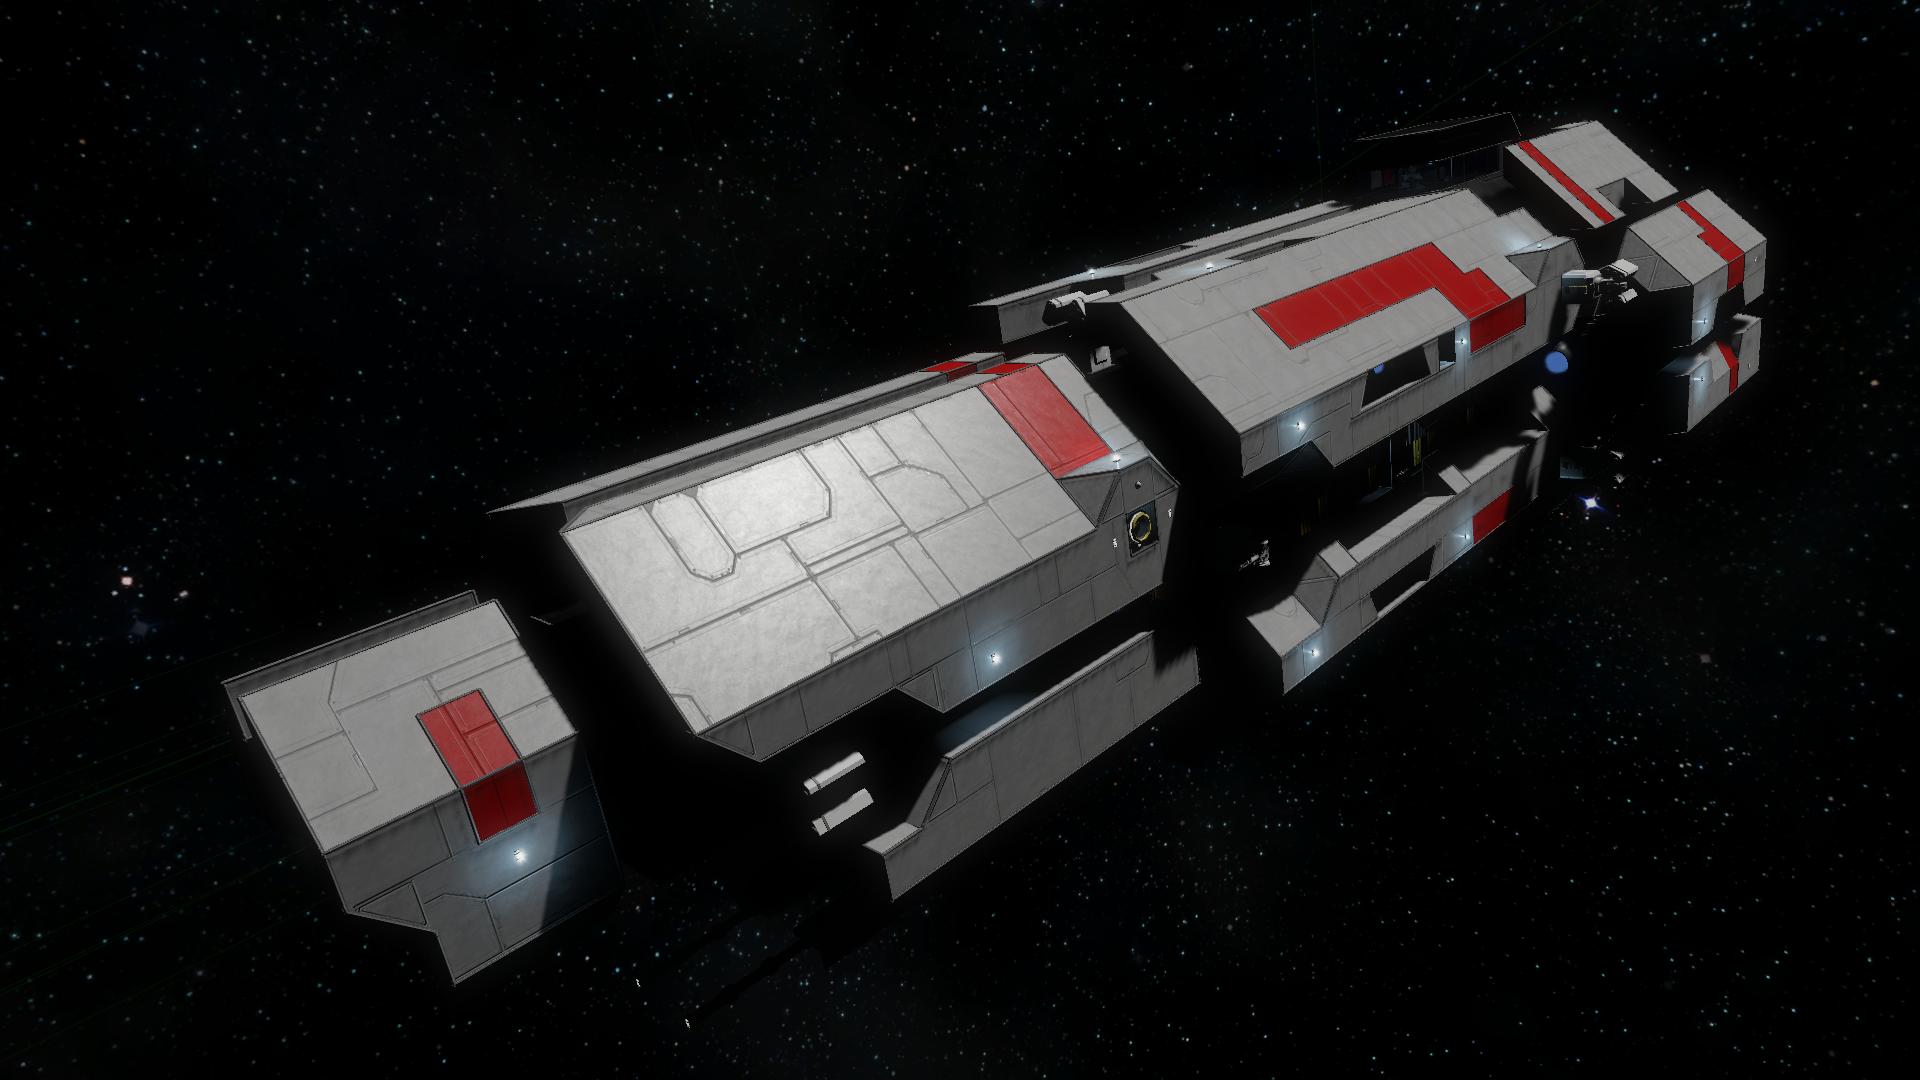 Cerberus-class Destroyer